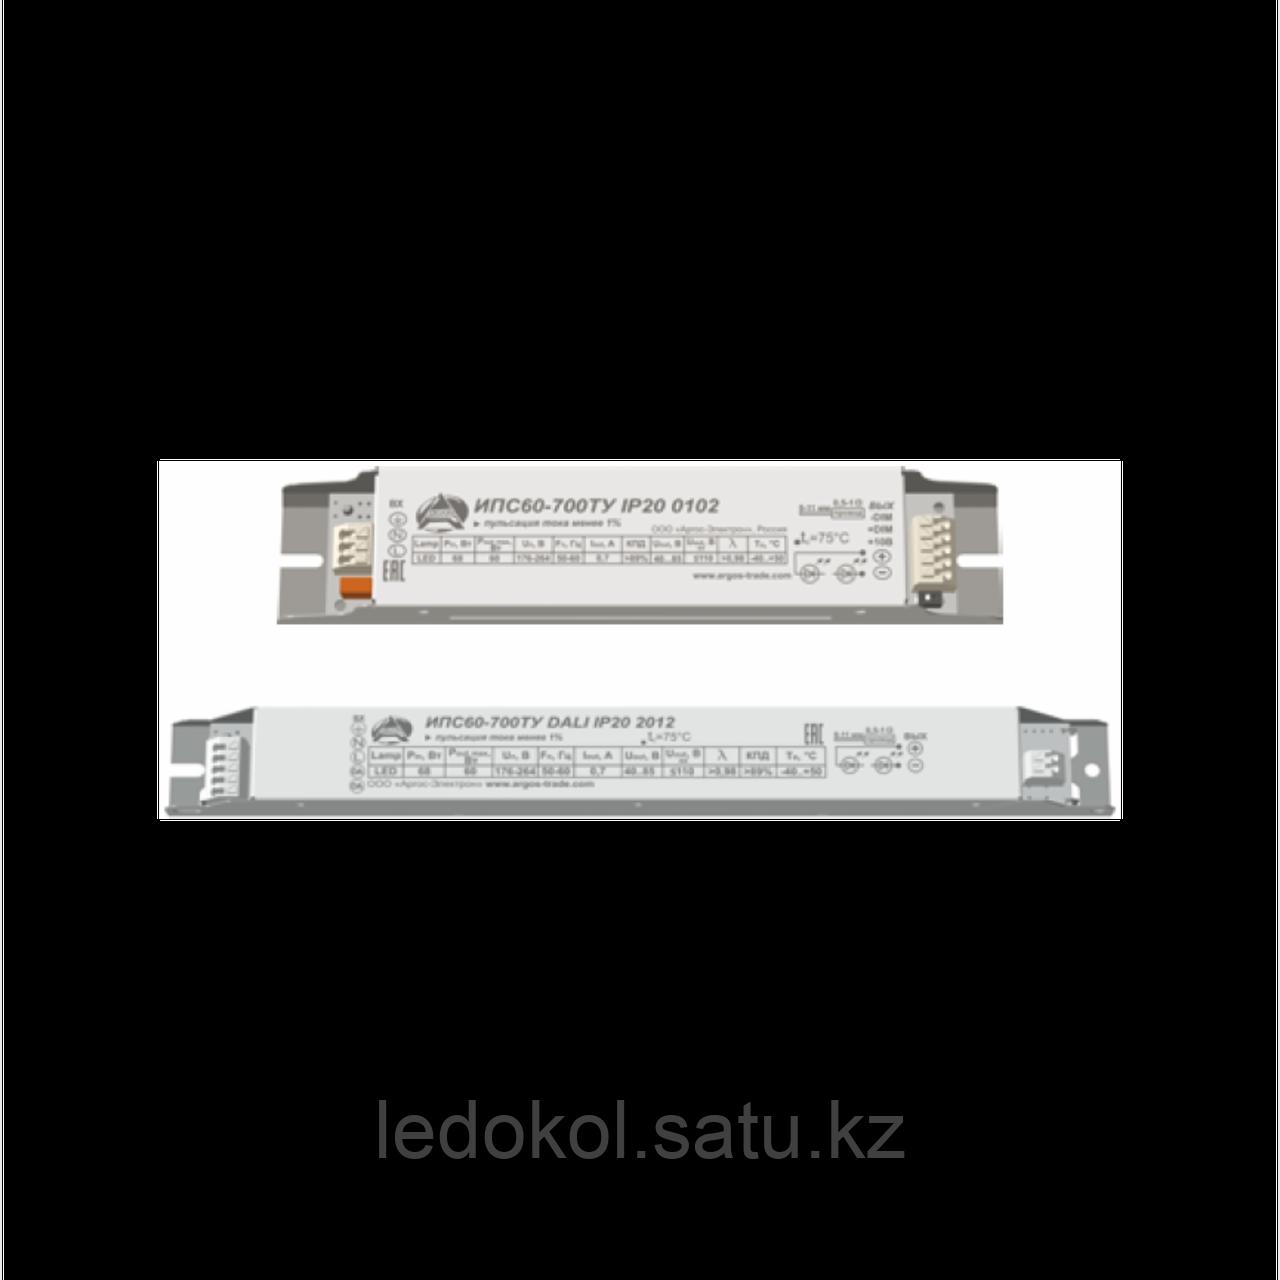 Источник питания Аргос ИПС60-700ТУ IP20 DALI 2012